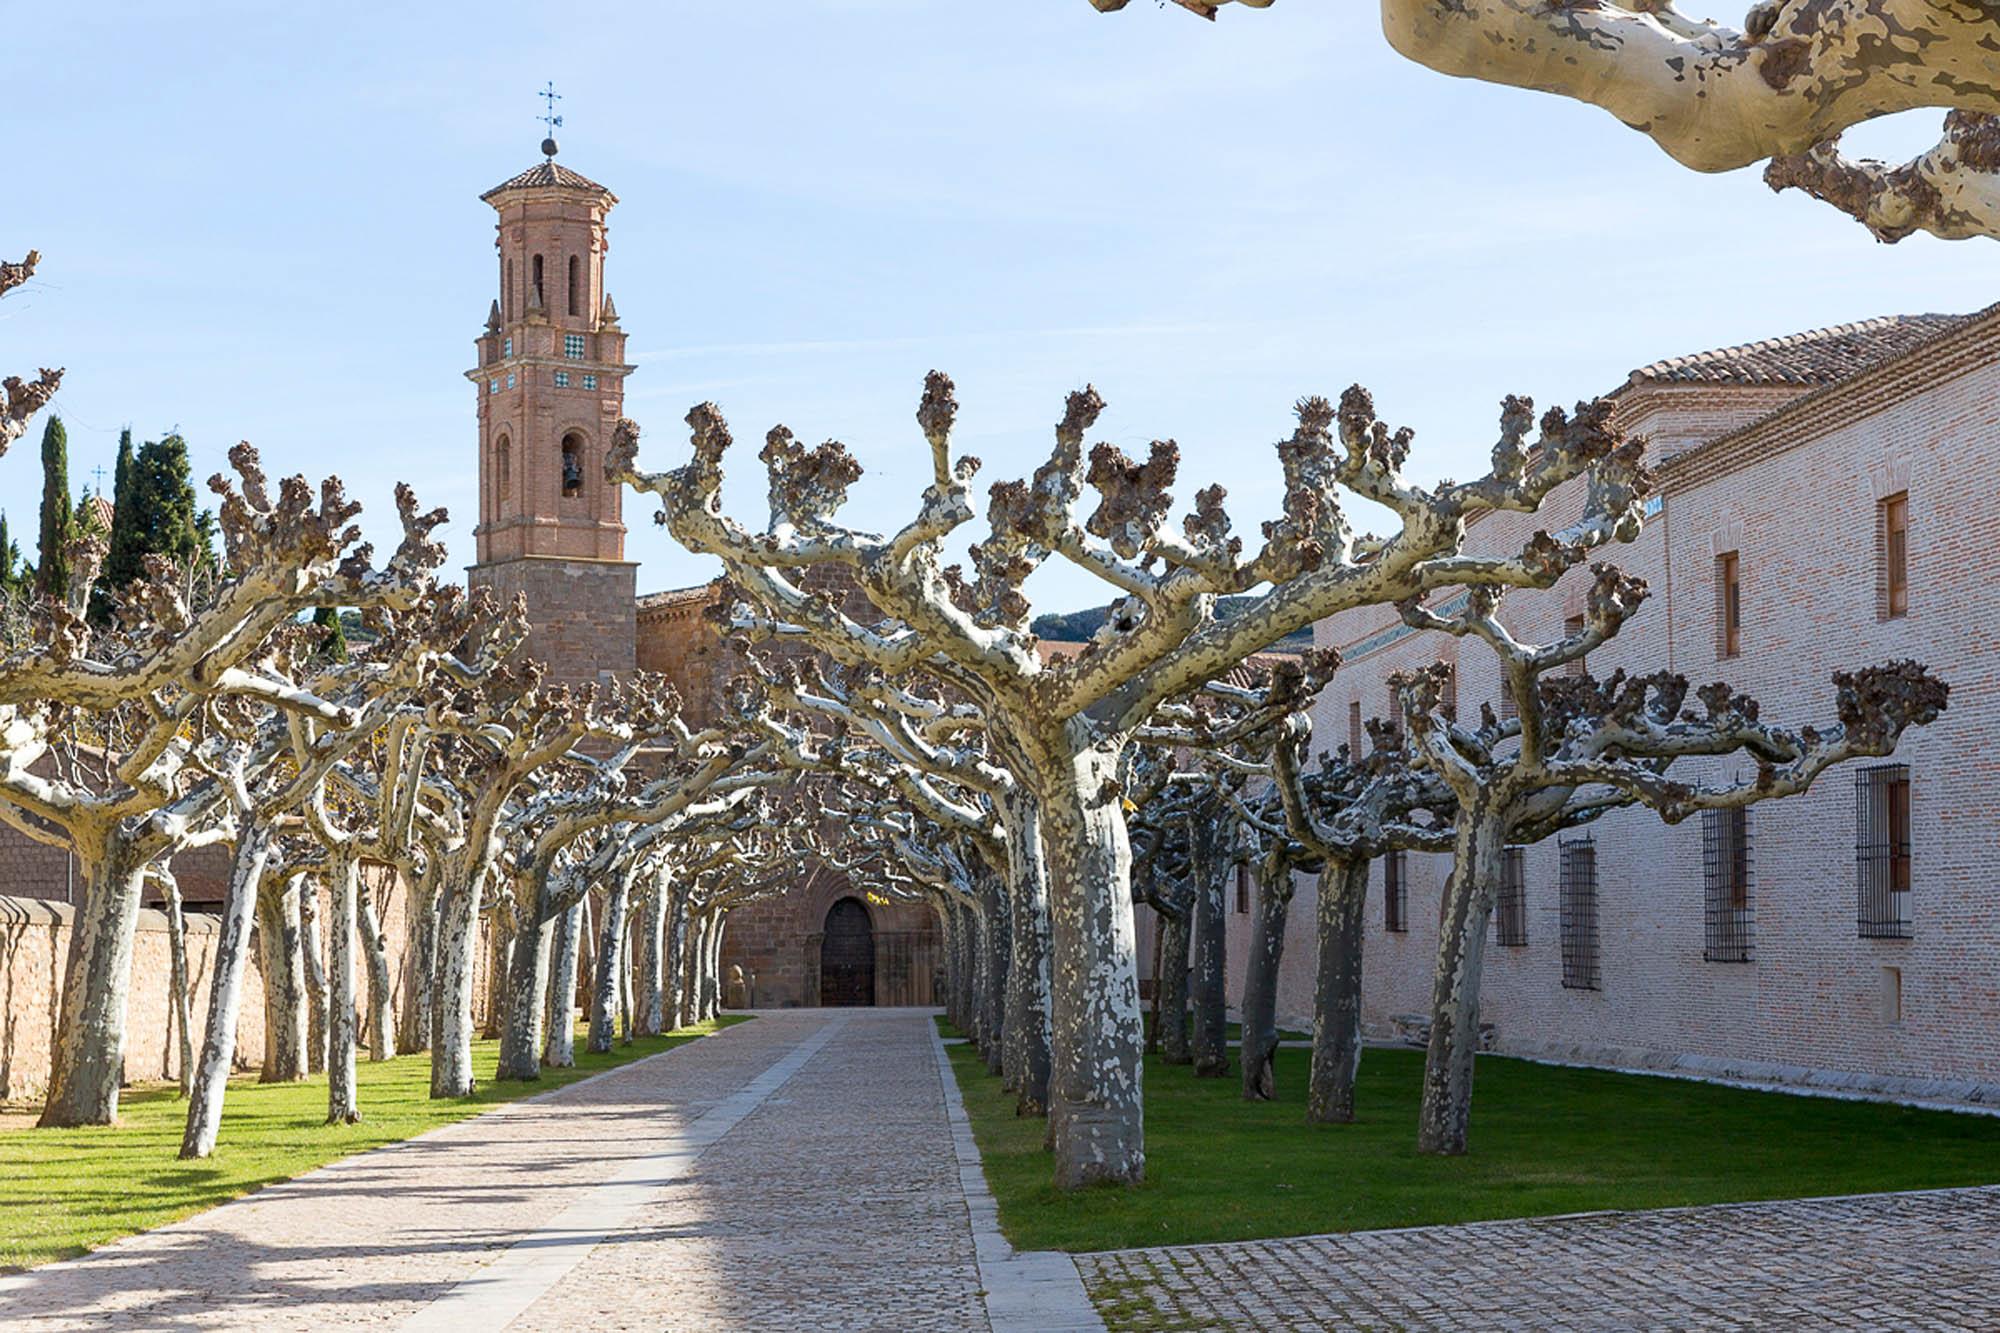 Ruta del Císter en Aragón